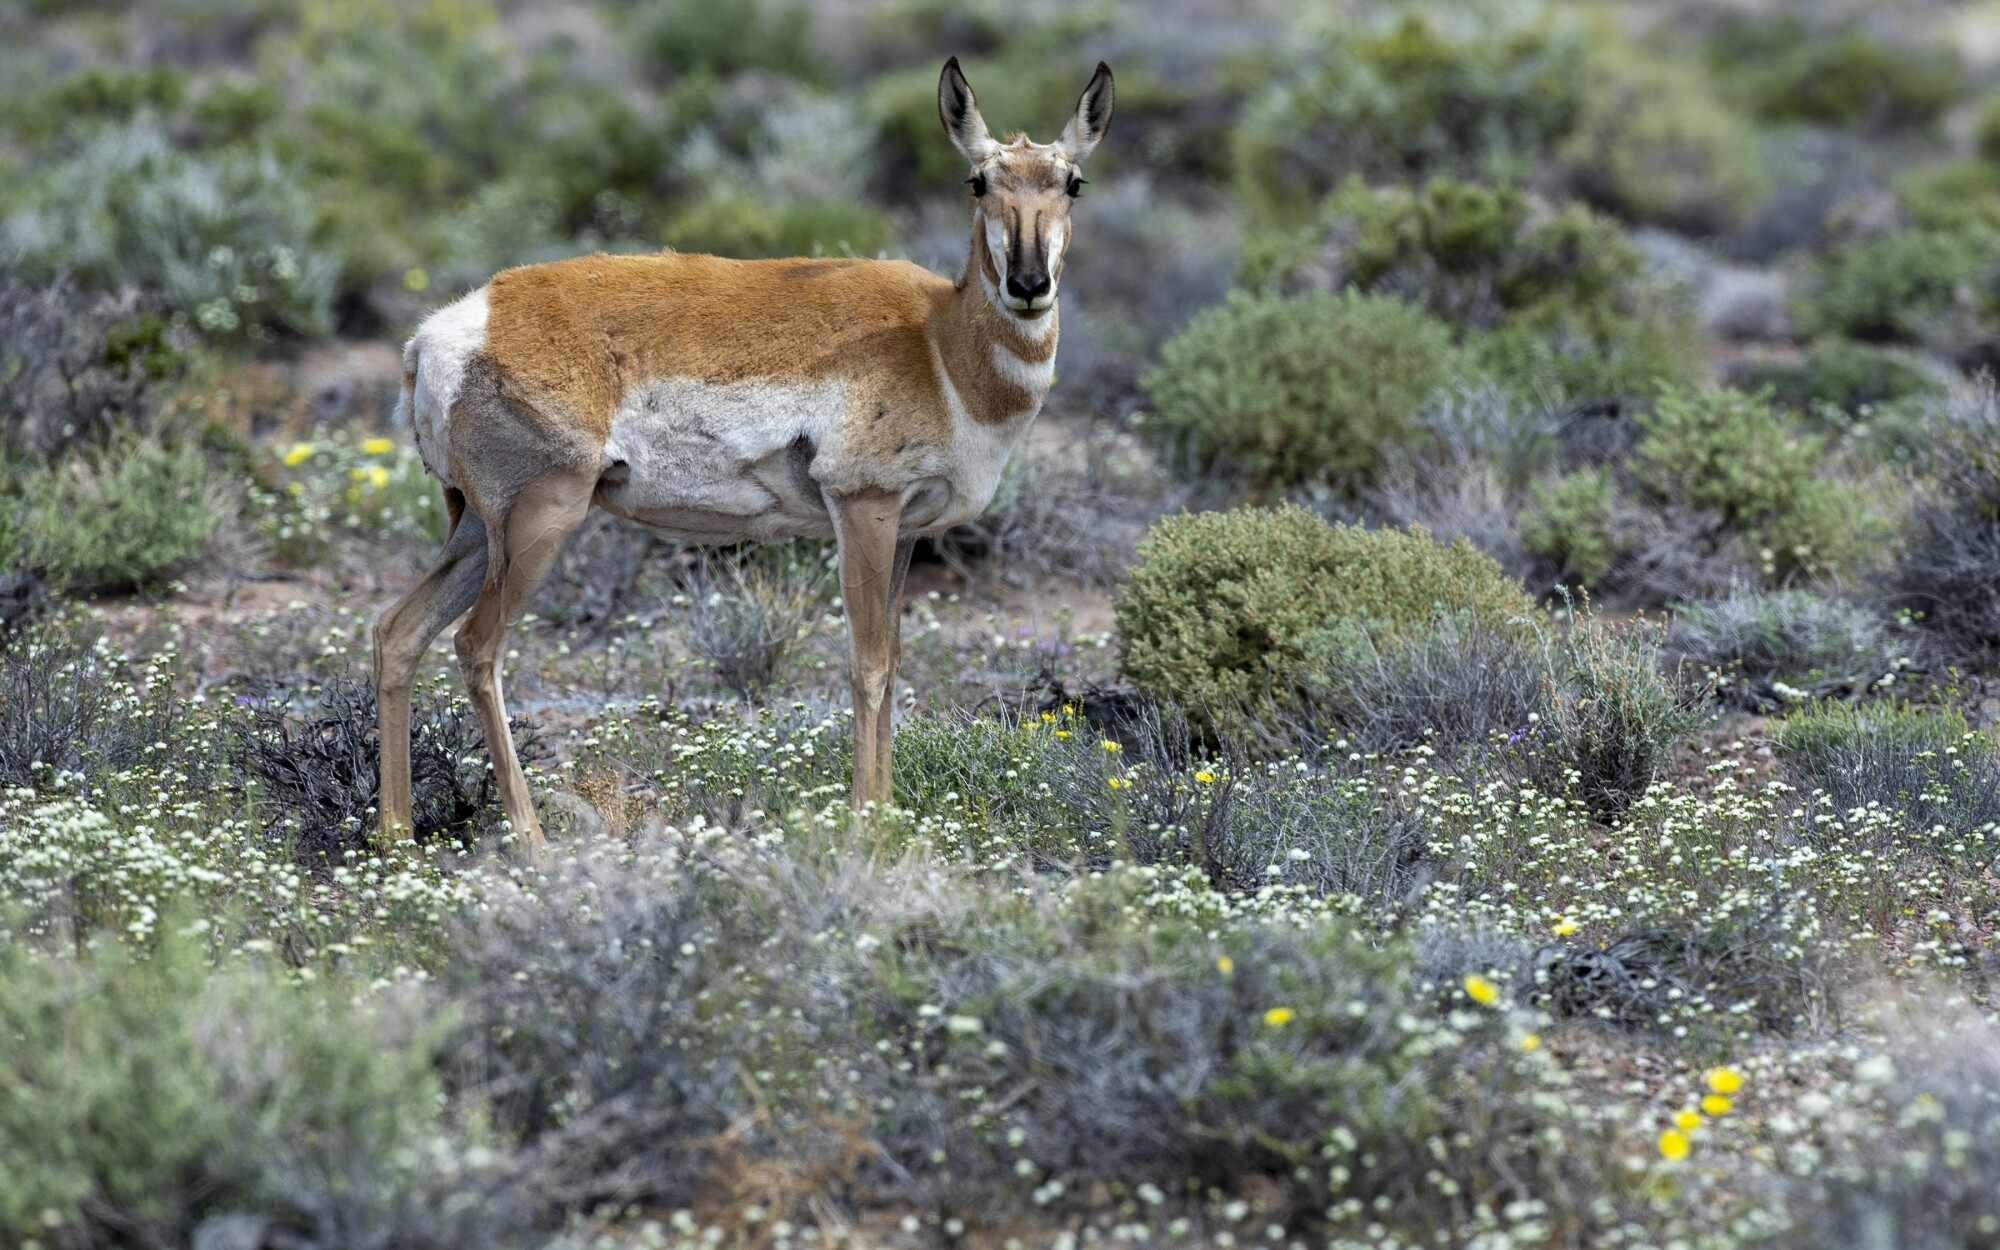 535399-me-pronghorn-antelope-10-BRV.jpg